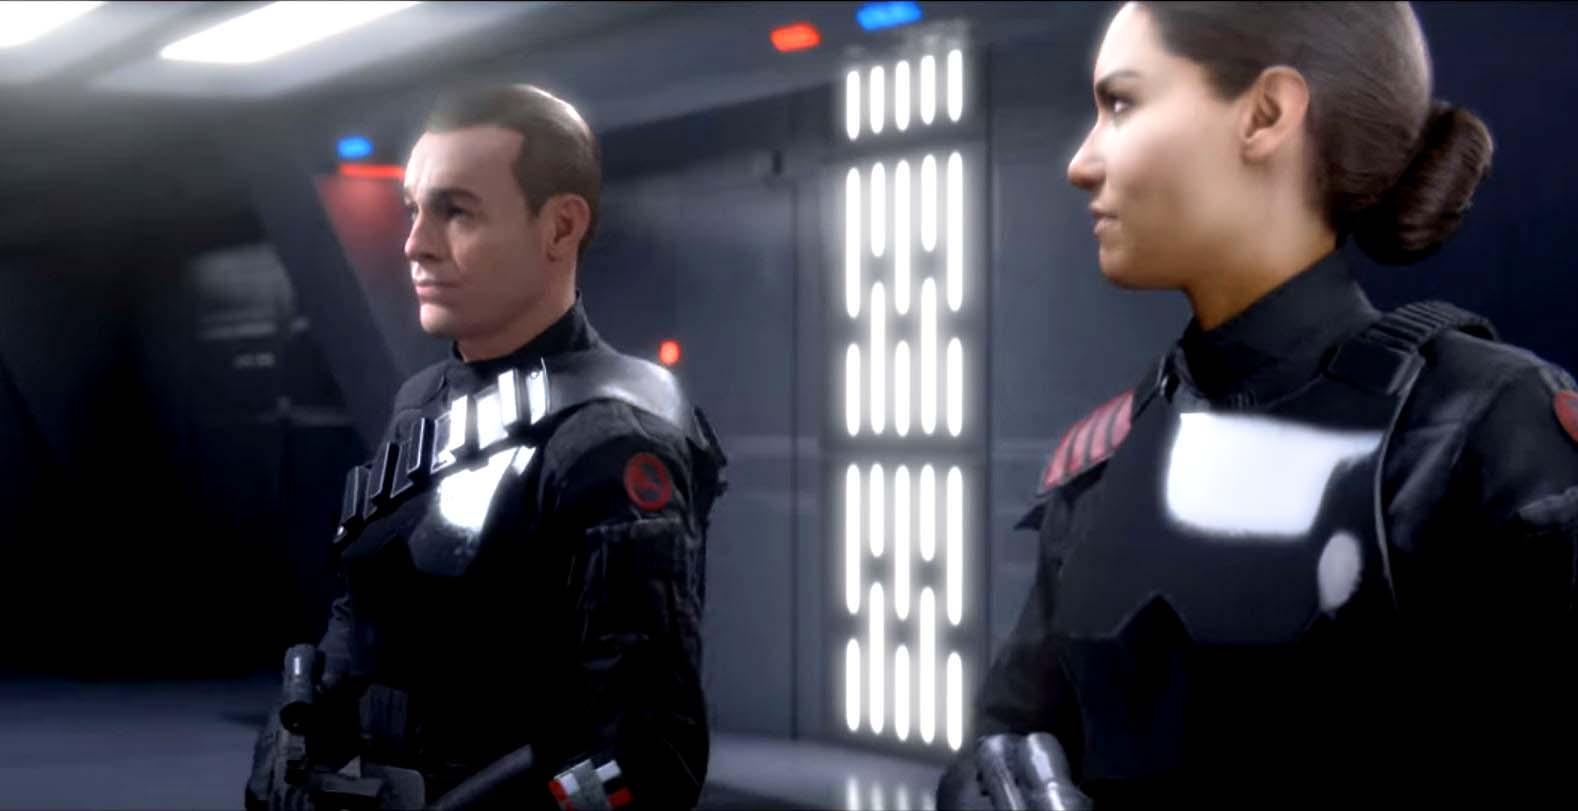 inferno squad cutscene star wars battlefront ii storia singleplayer